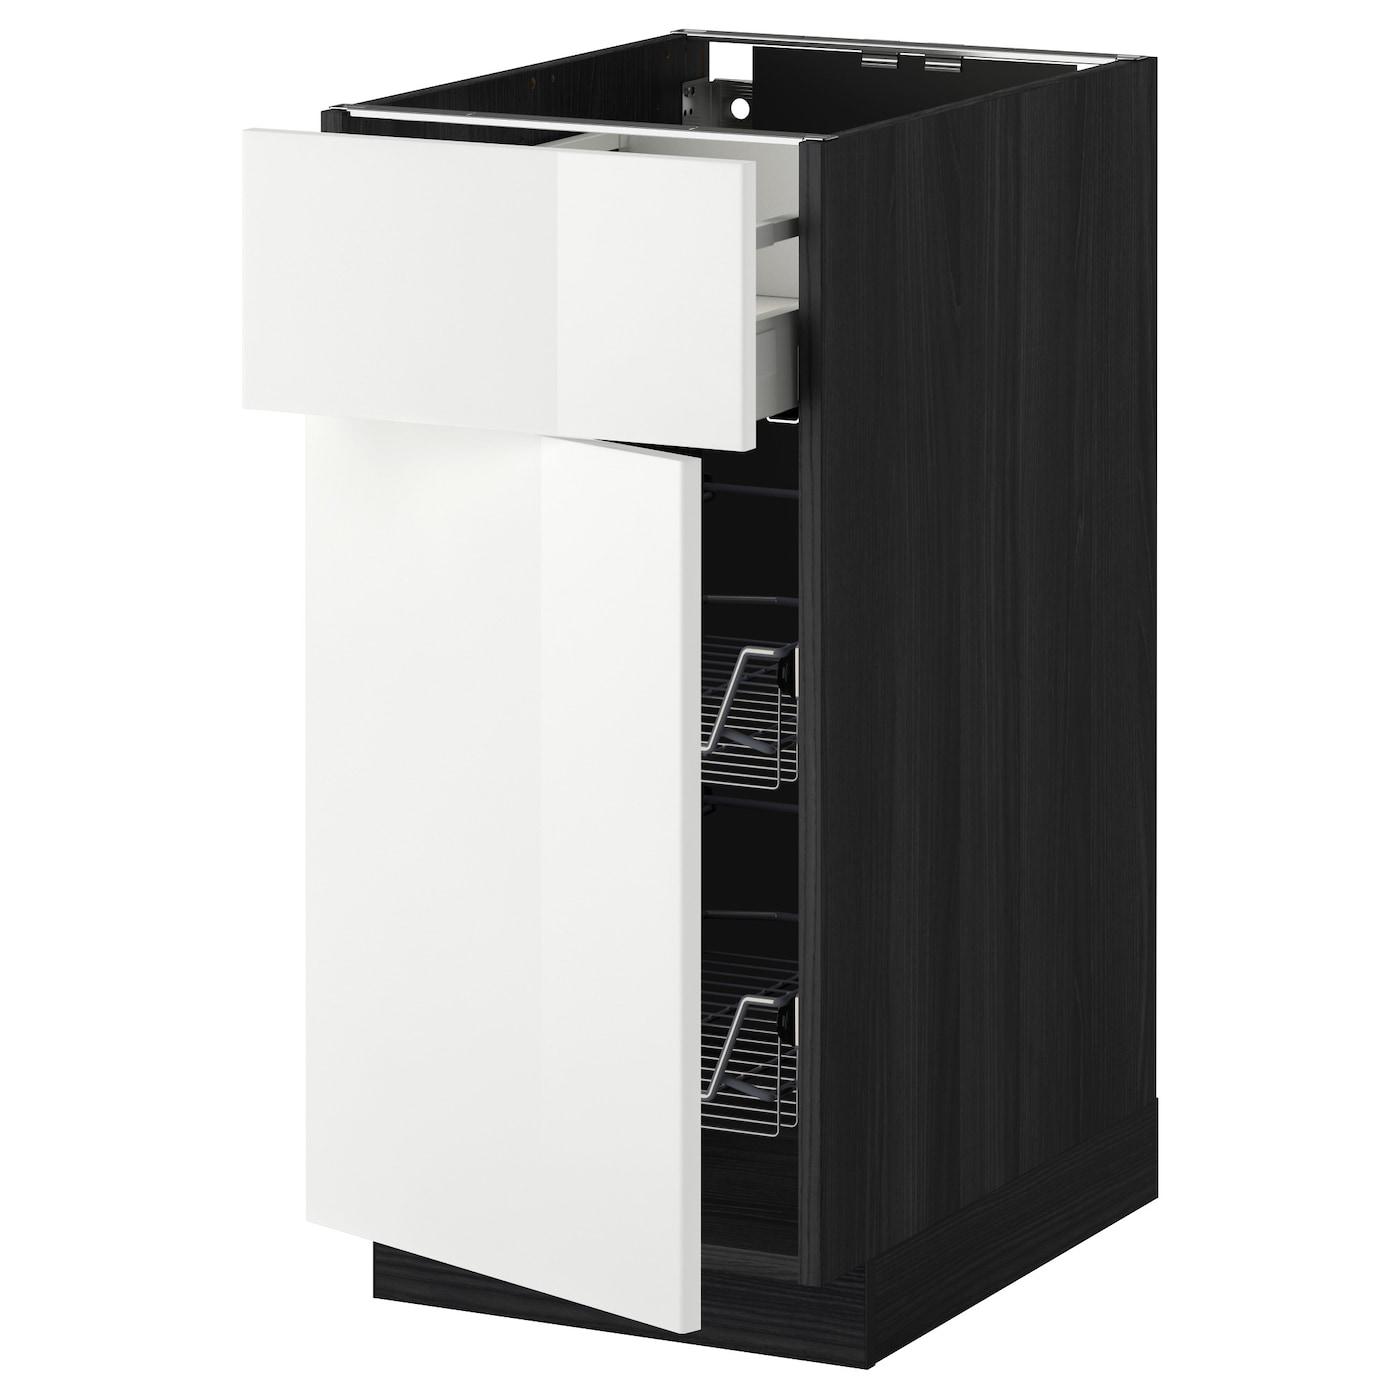 Metod maximera base cab w wire basket drawer door black for Basket for kitchen cabinets